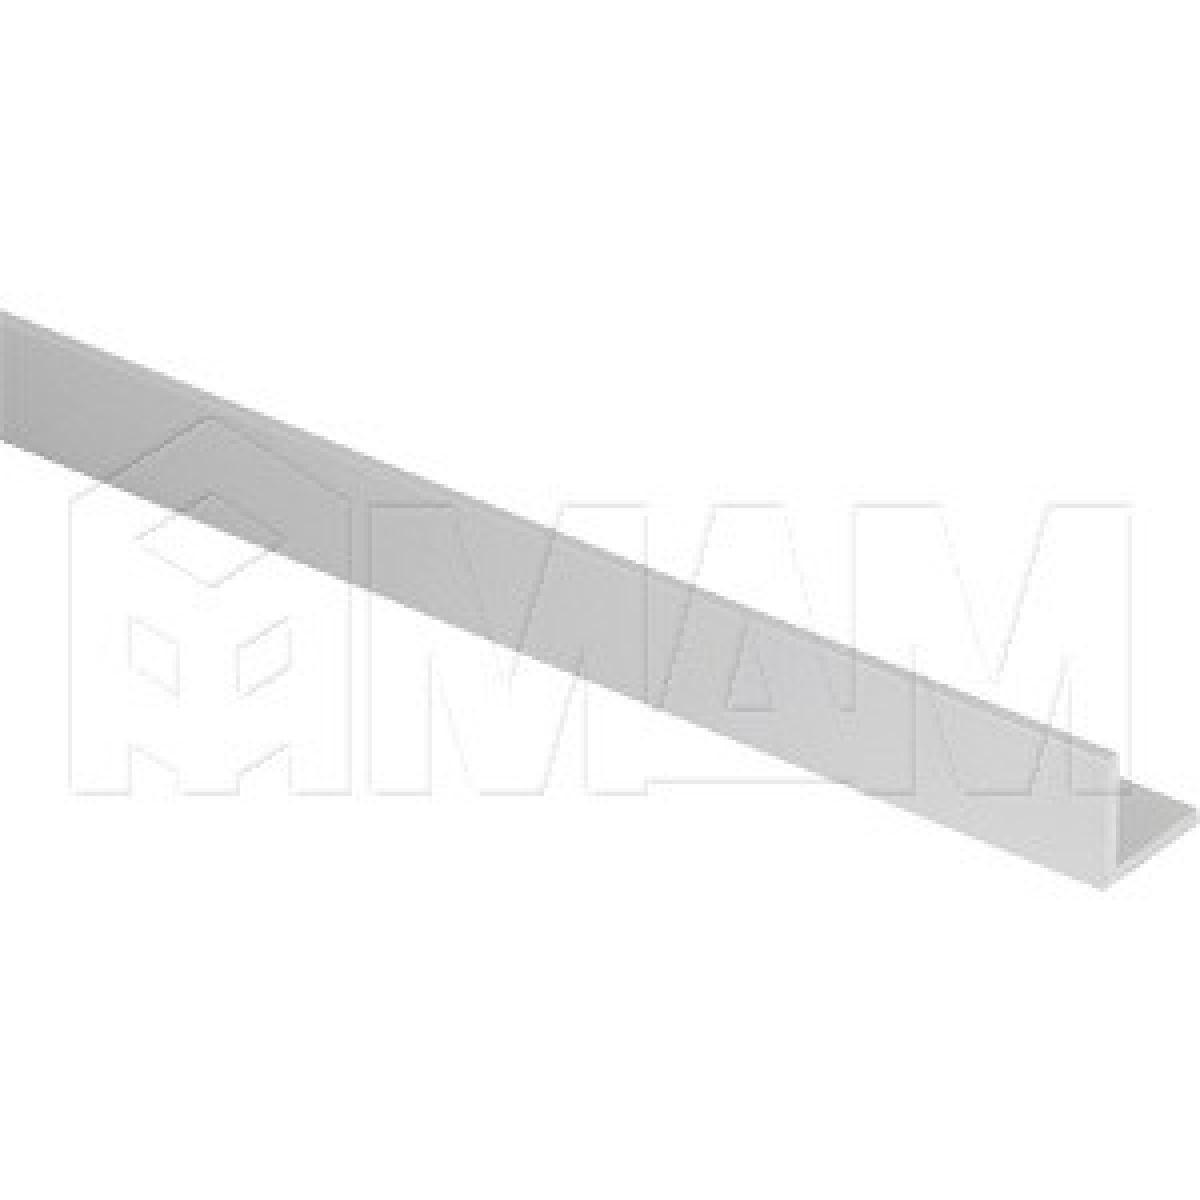 PS23 Направл. нижн., серебро анод., L-6000